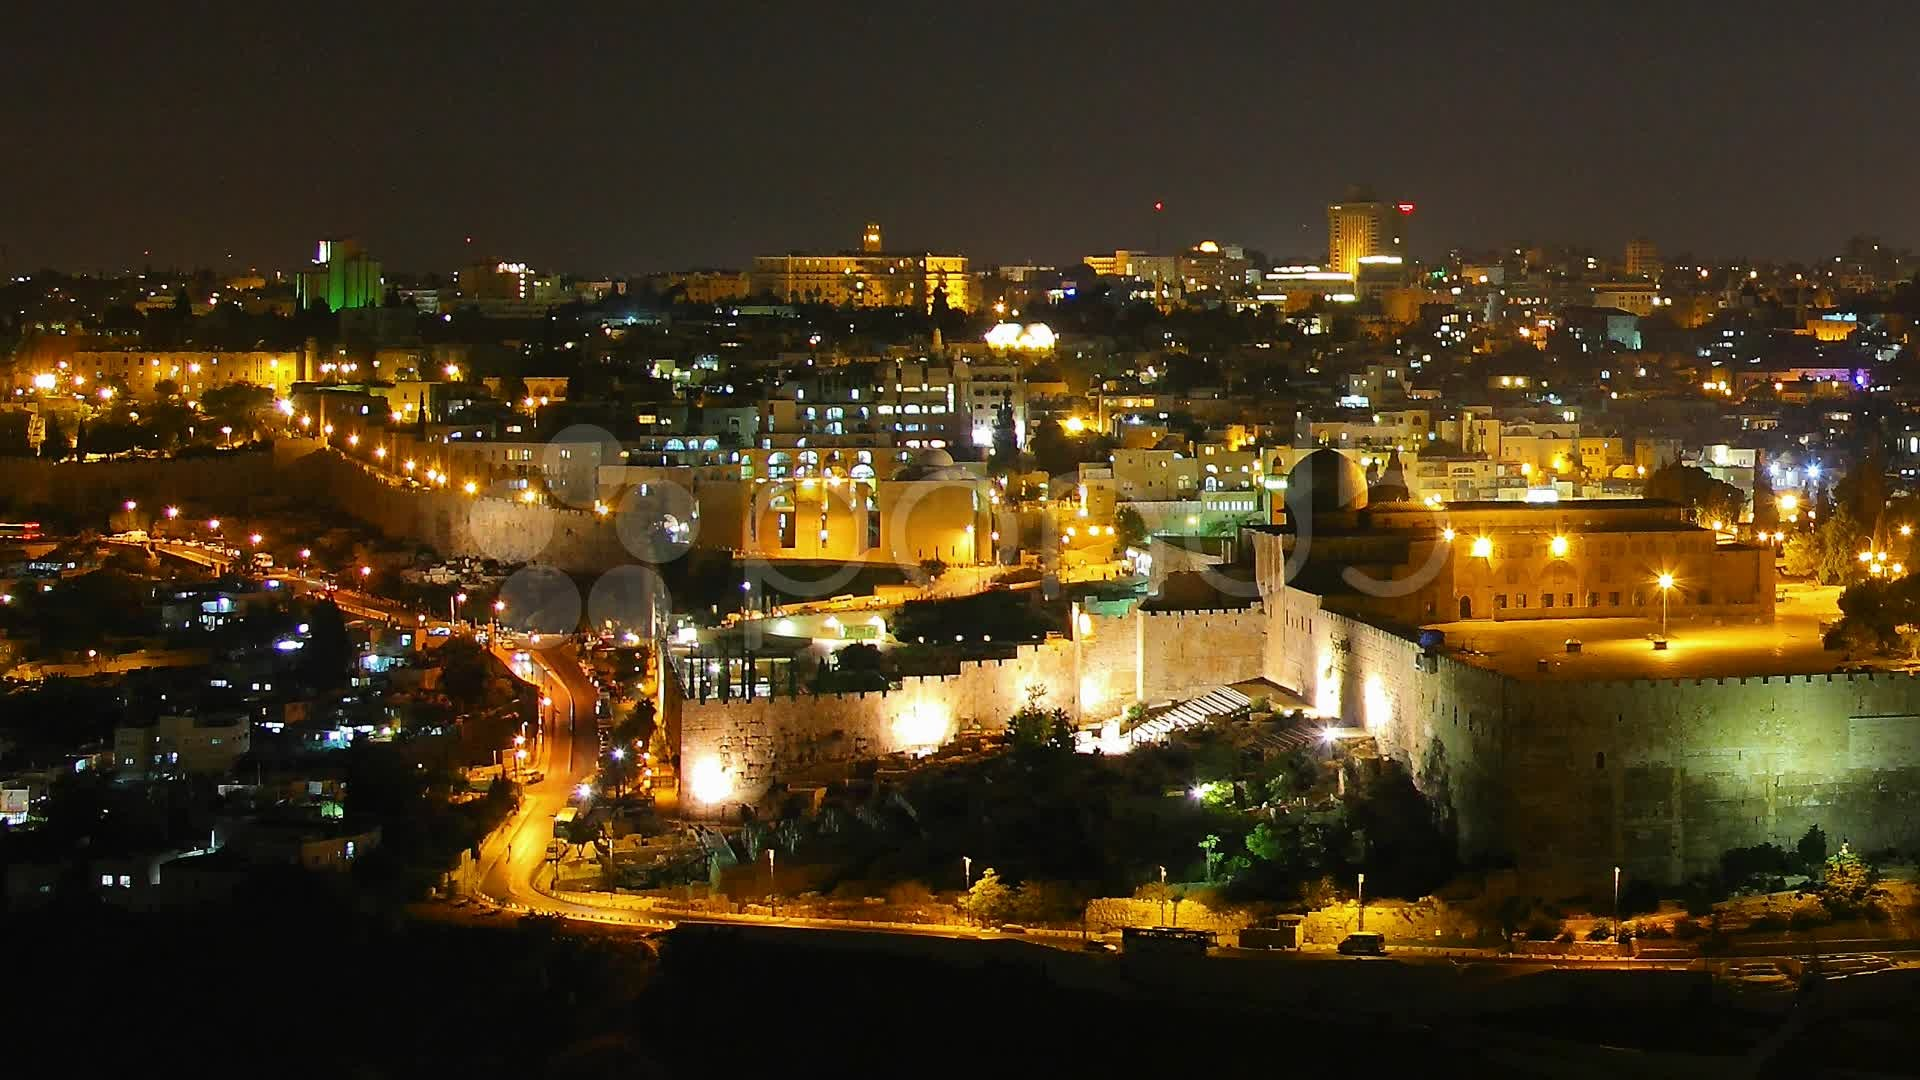 Video: Skyline of Jerusalem, the Jewish Quarter at night time lapse .